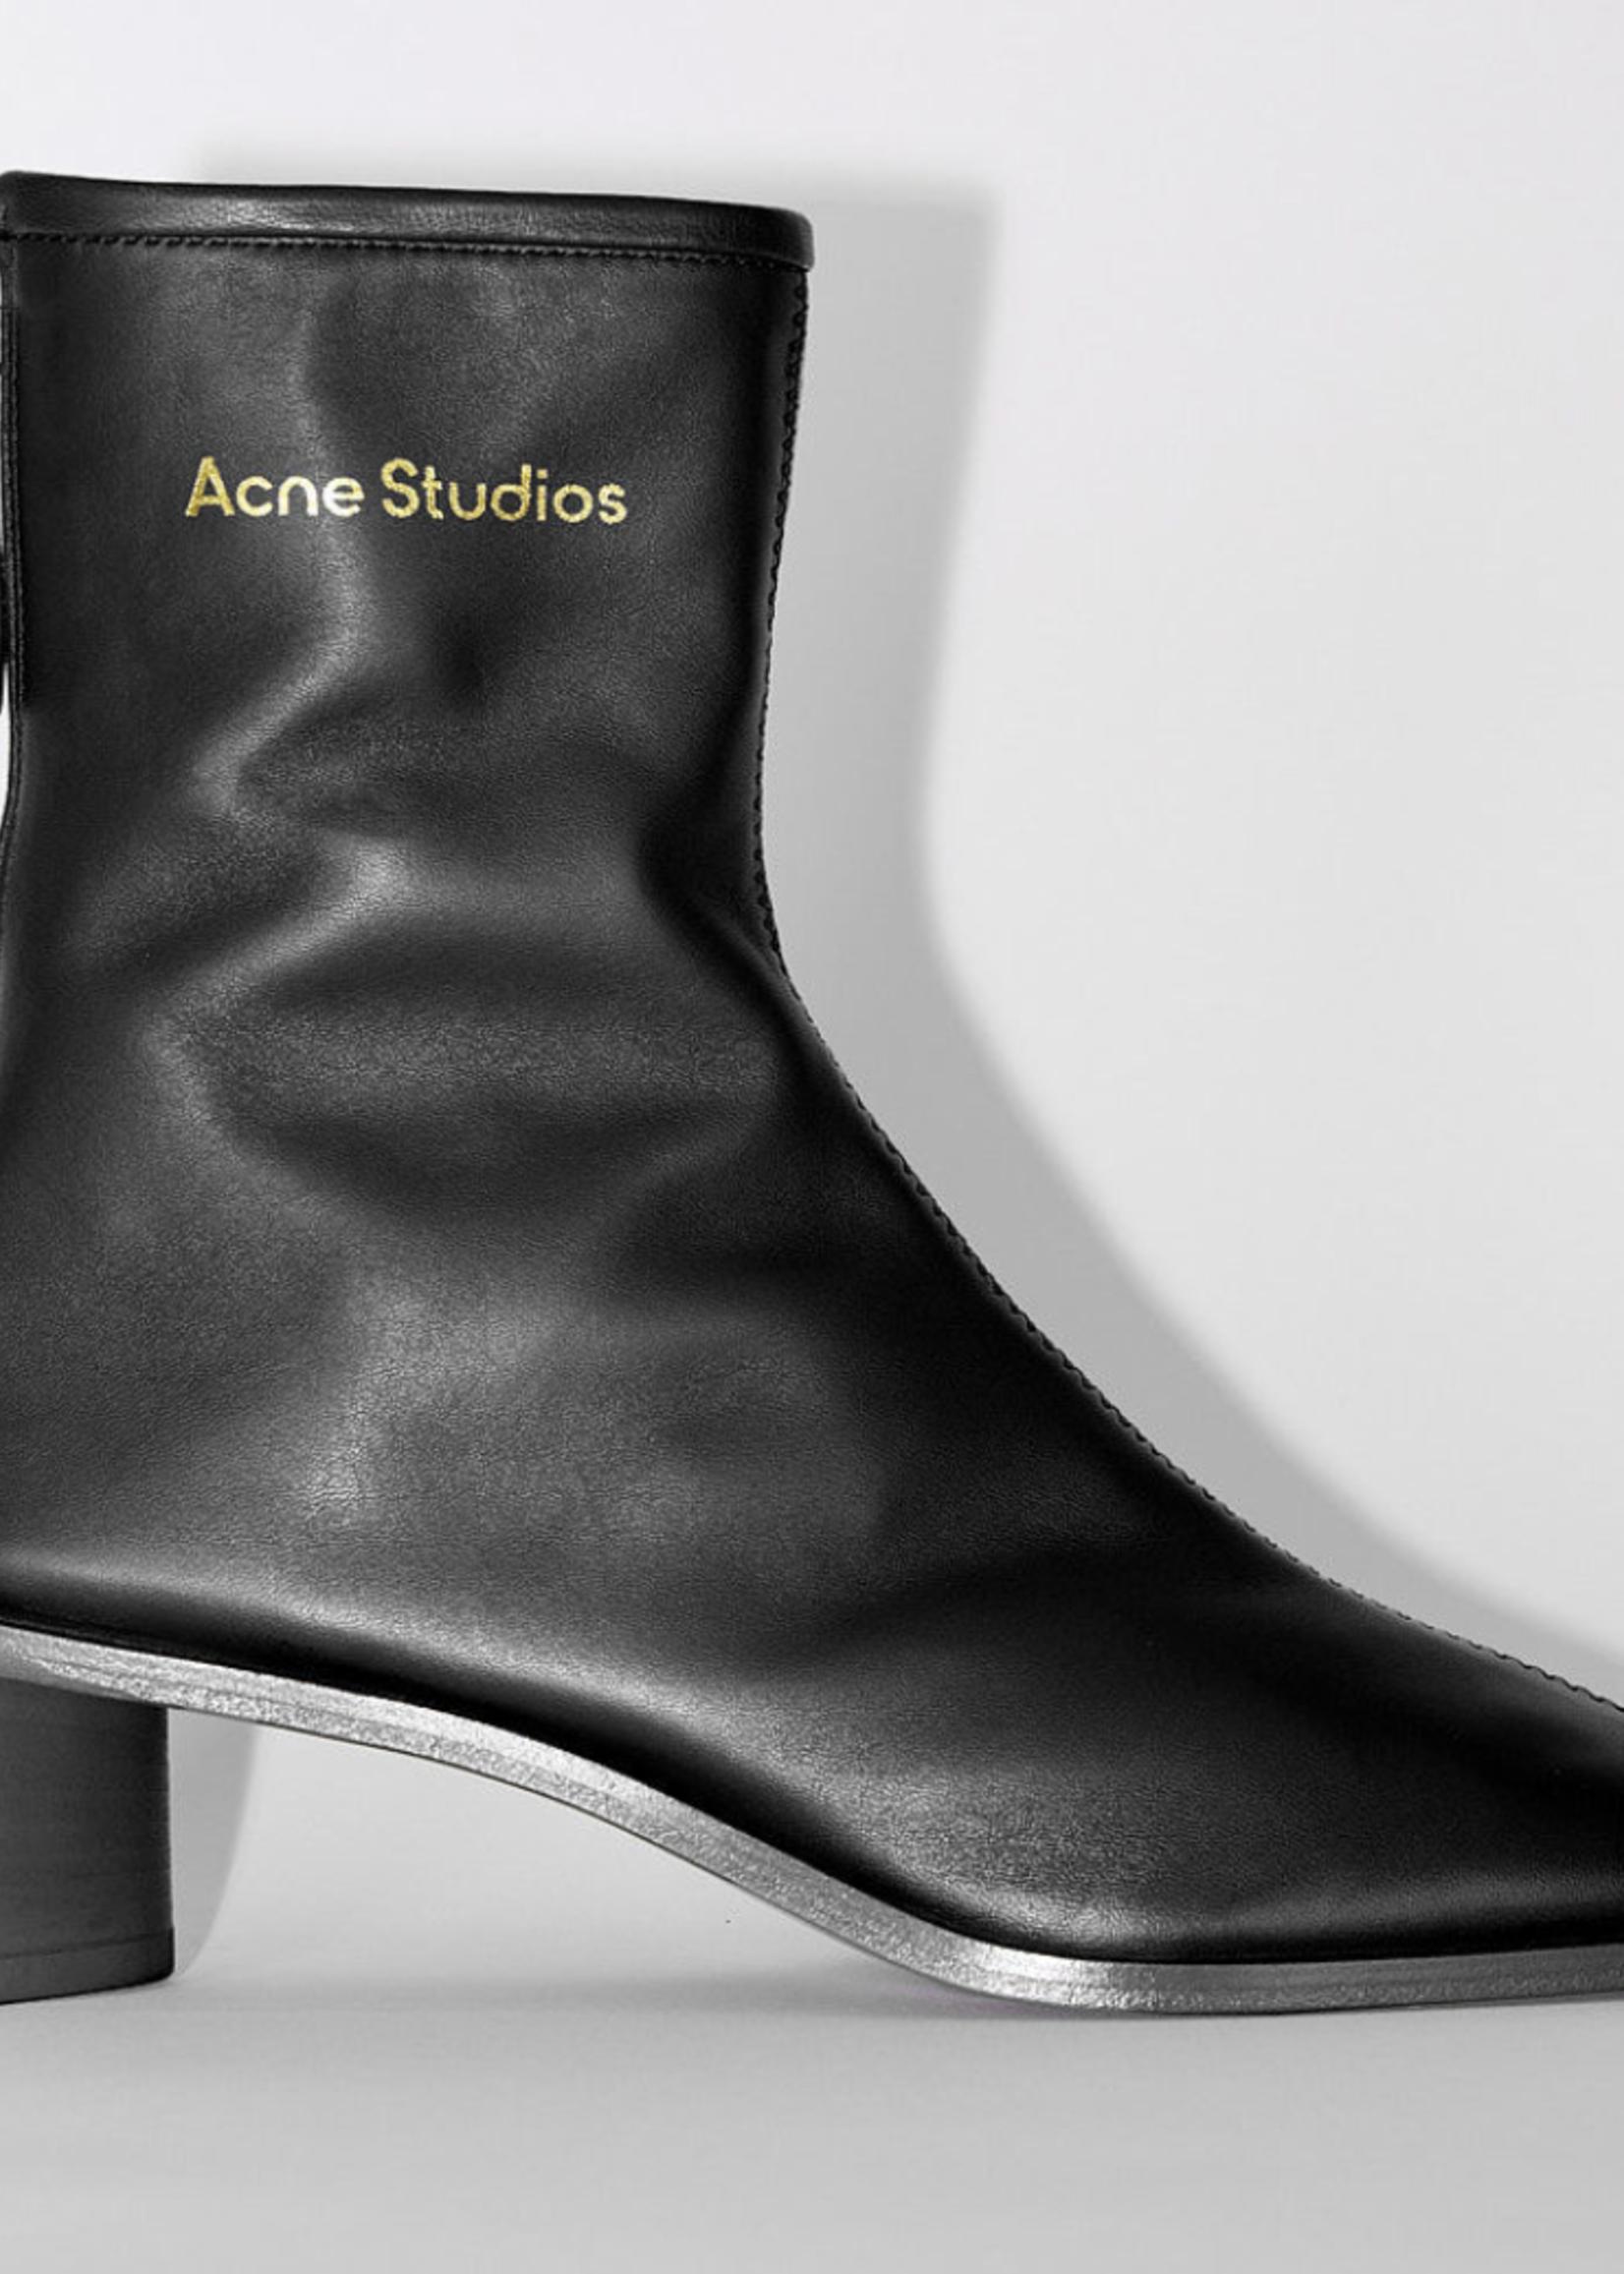 Acne Studios Acnestudios bertine  boots Black